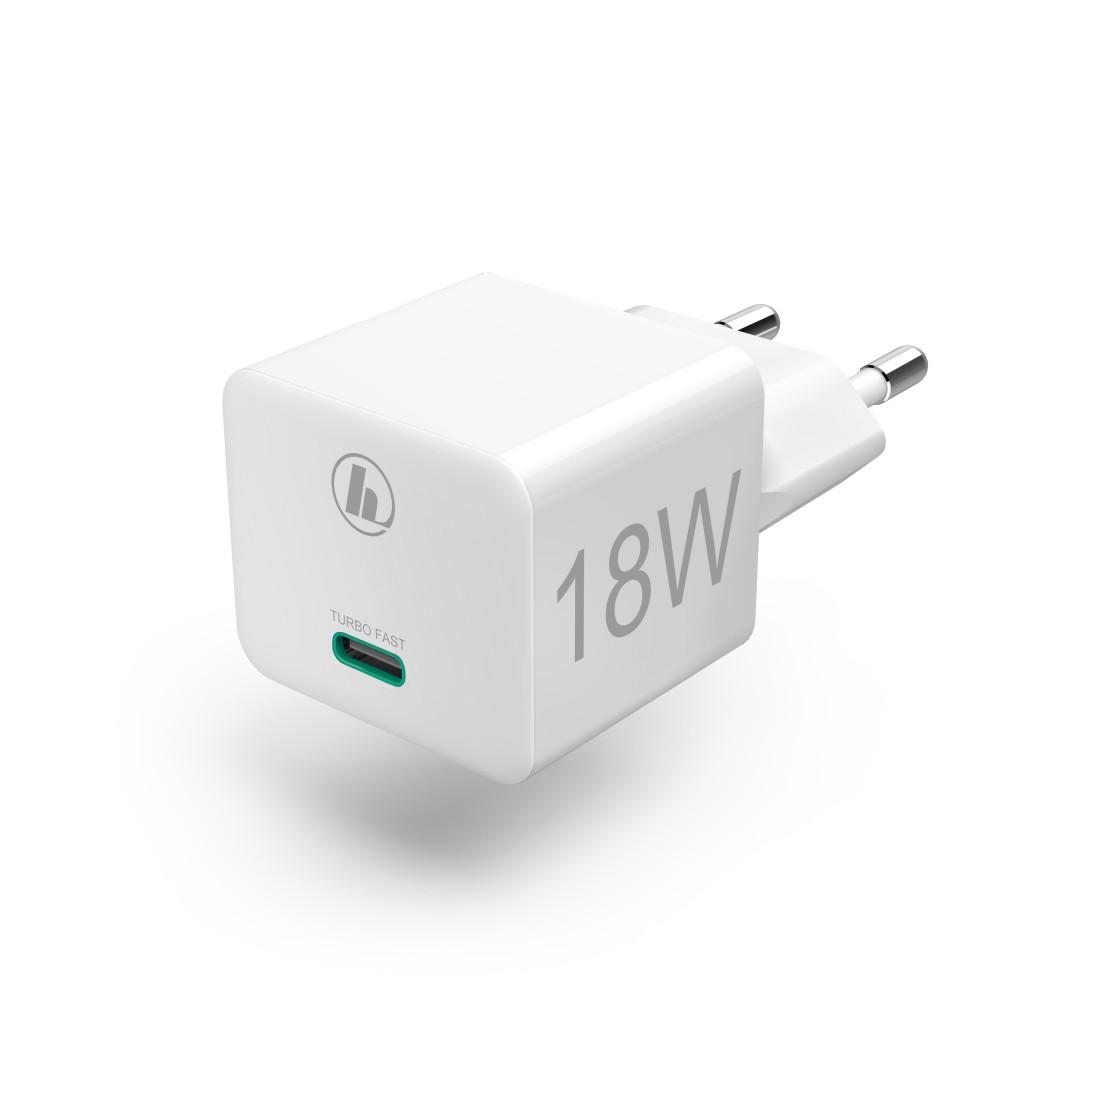 USB Schnellladegerät QC3.0 18W, Quick Charge USB Netzteil